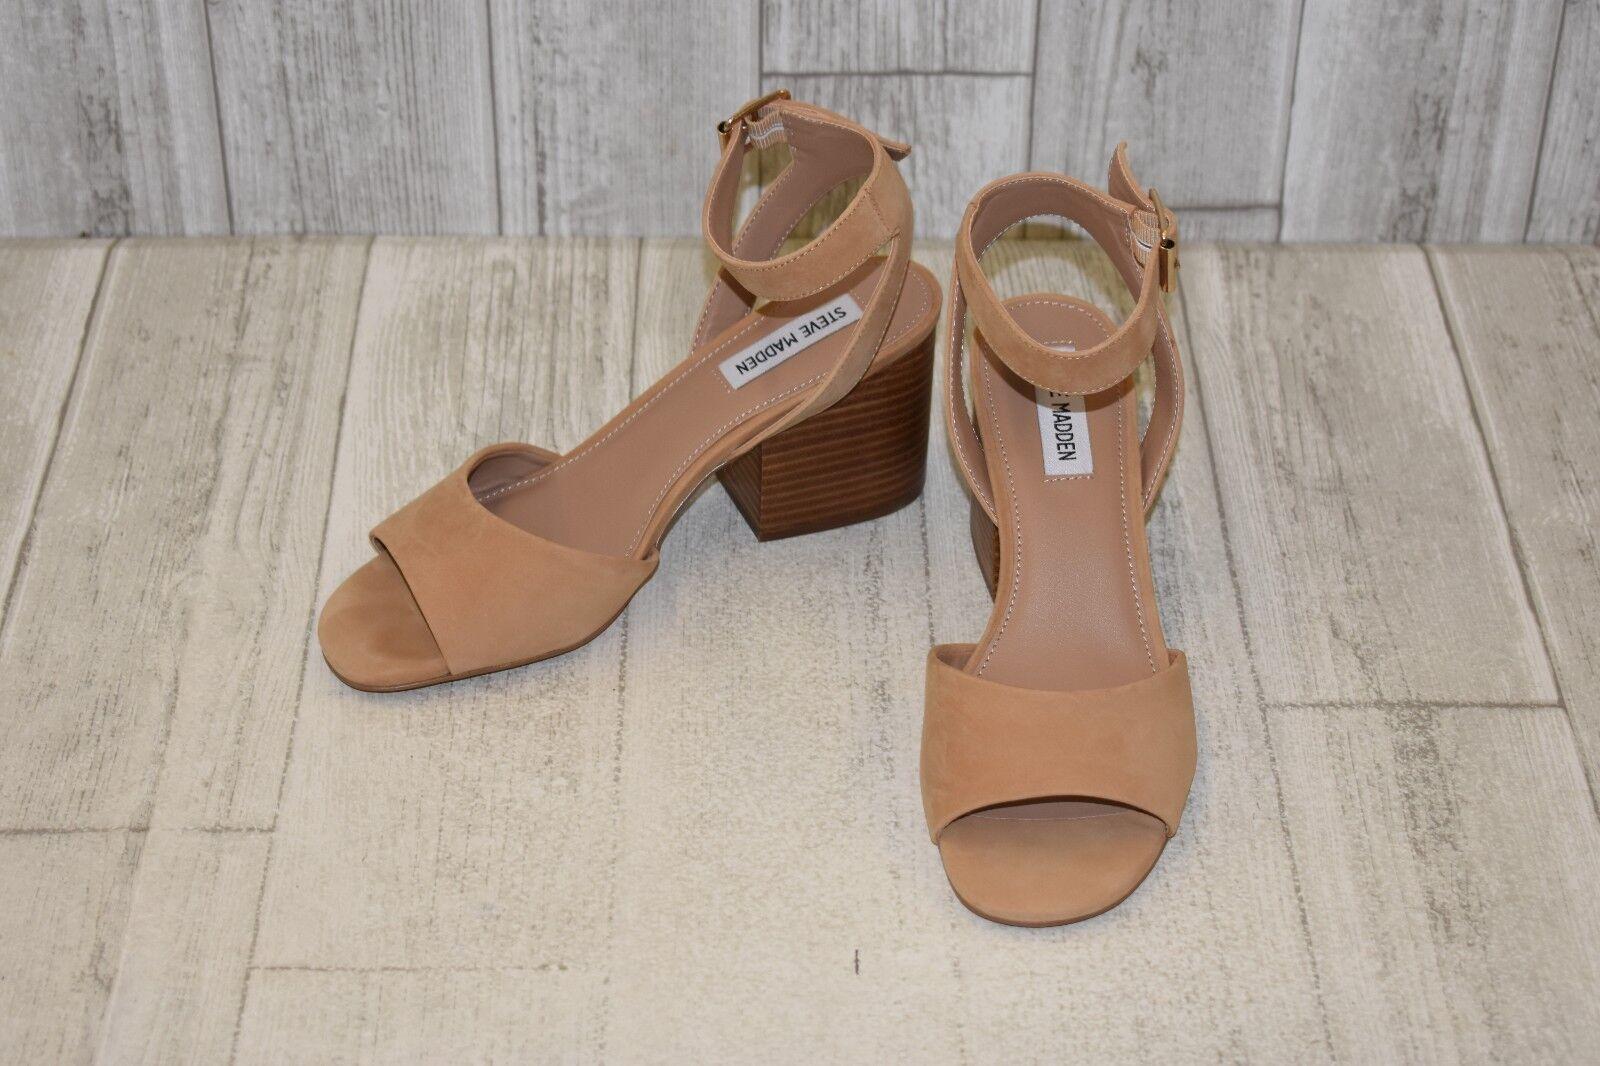 Steve Madden Devlin Nubuck Ankle Strap Sandals, Women's Size 8M, Tan